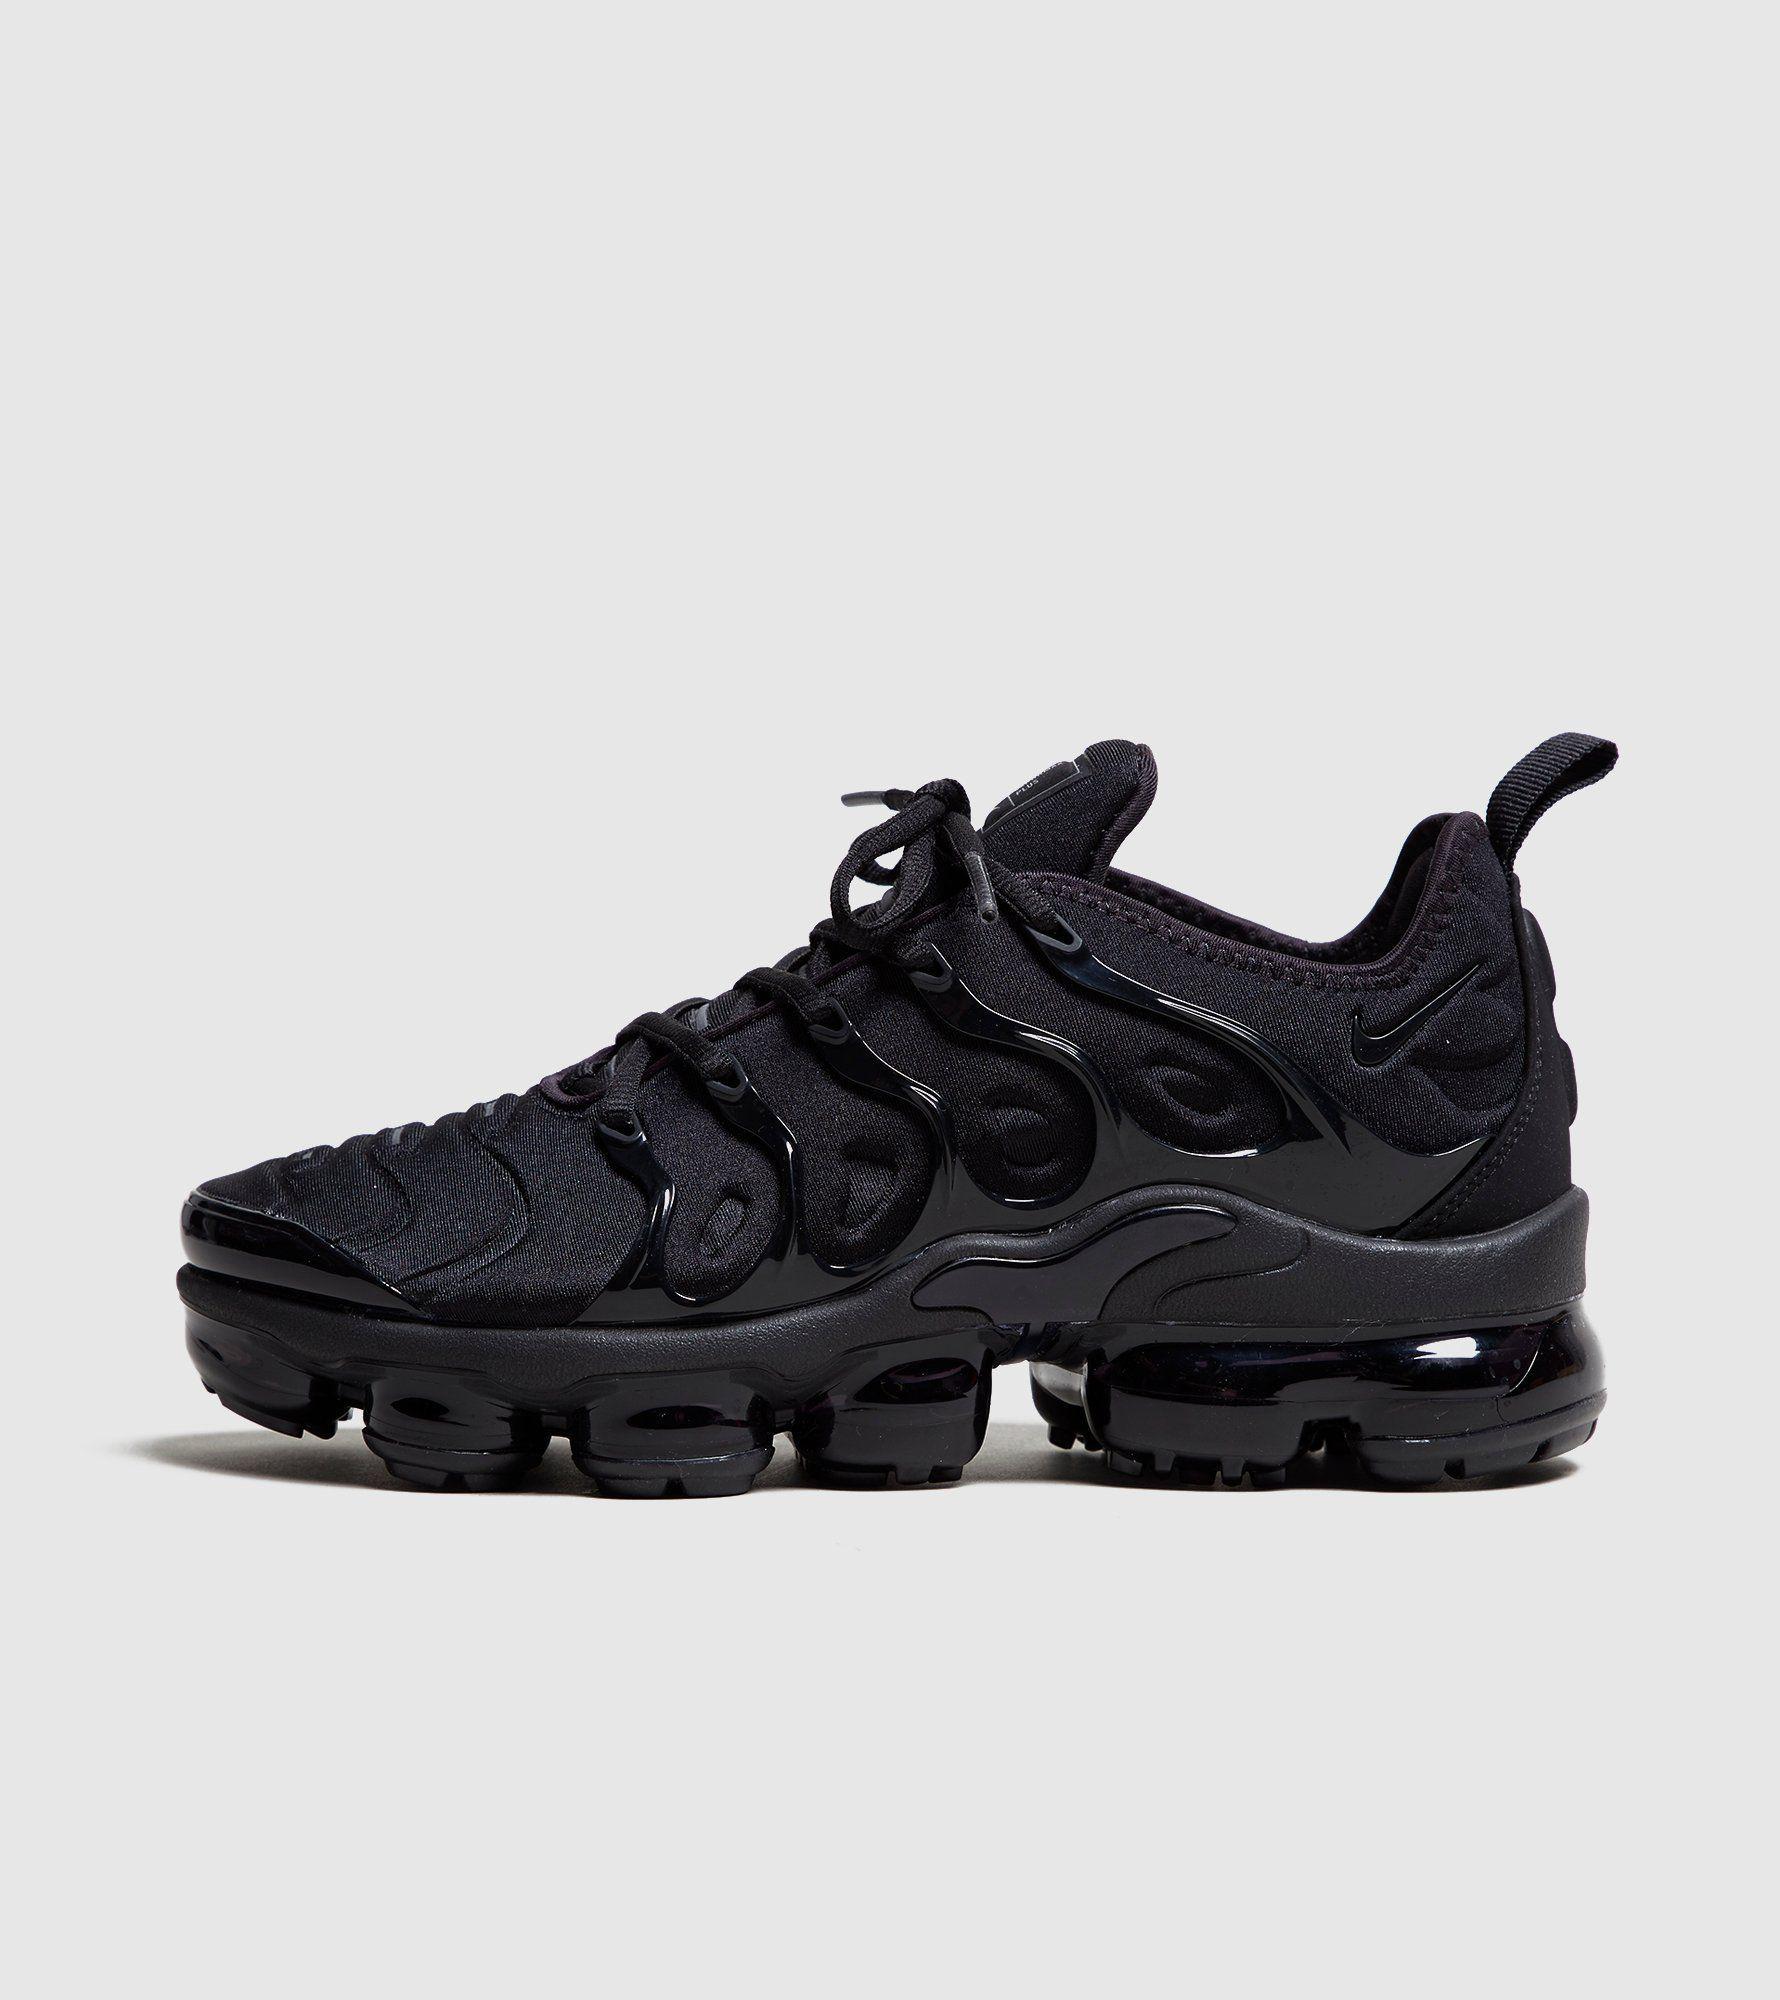 069abffa6cba4 Nike Air VaporMax Plus Women's in 2019   Shooz   Black nike shoes ...